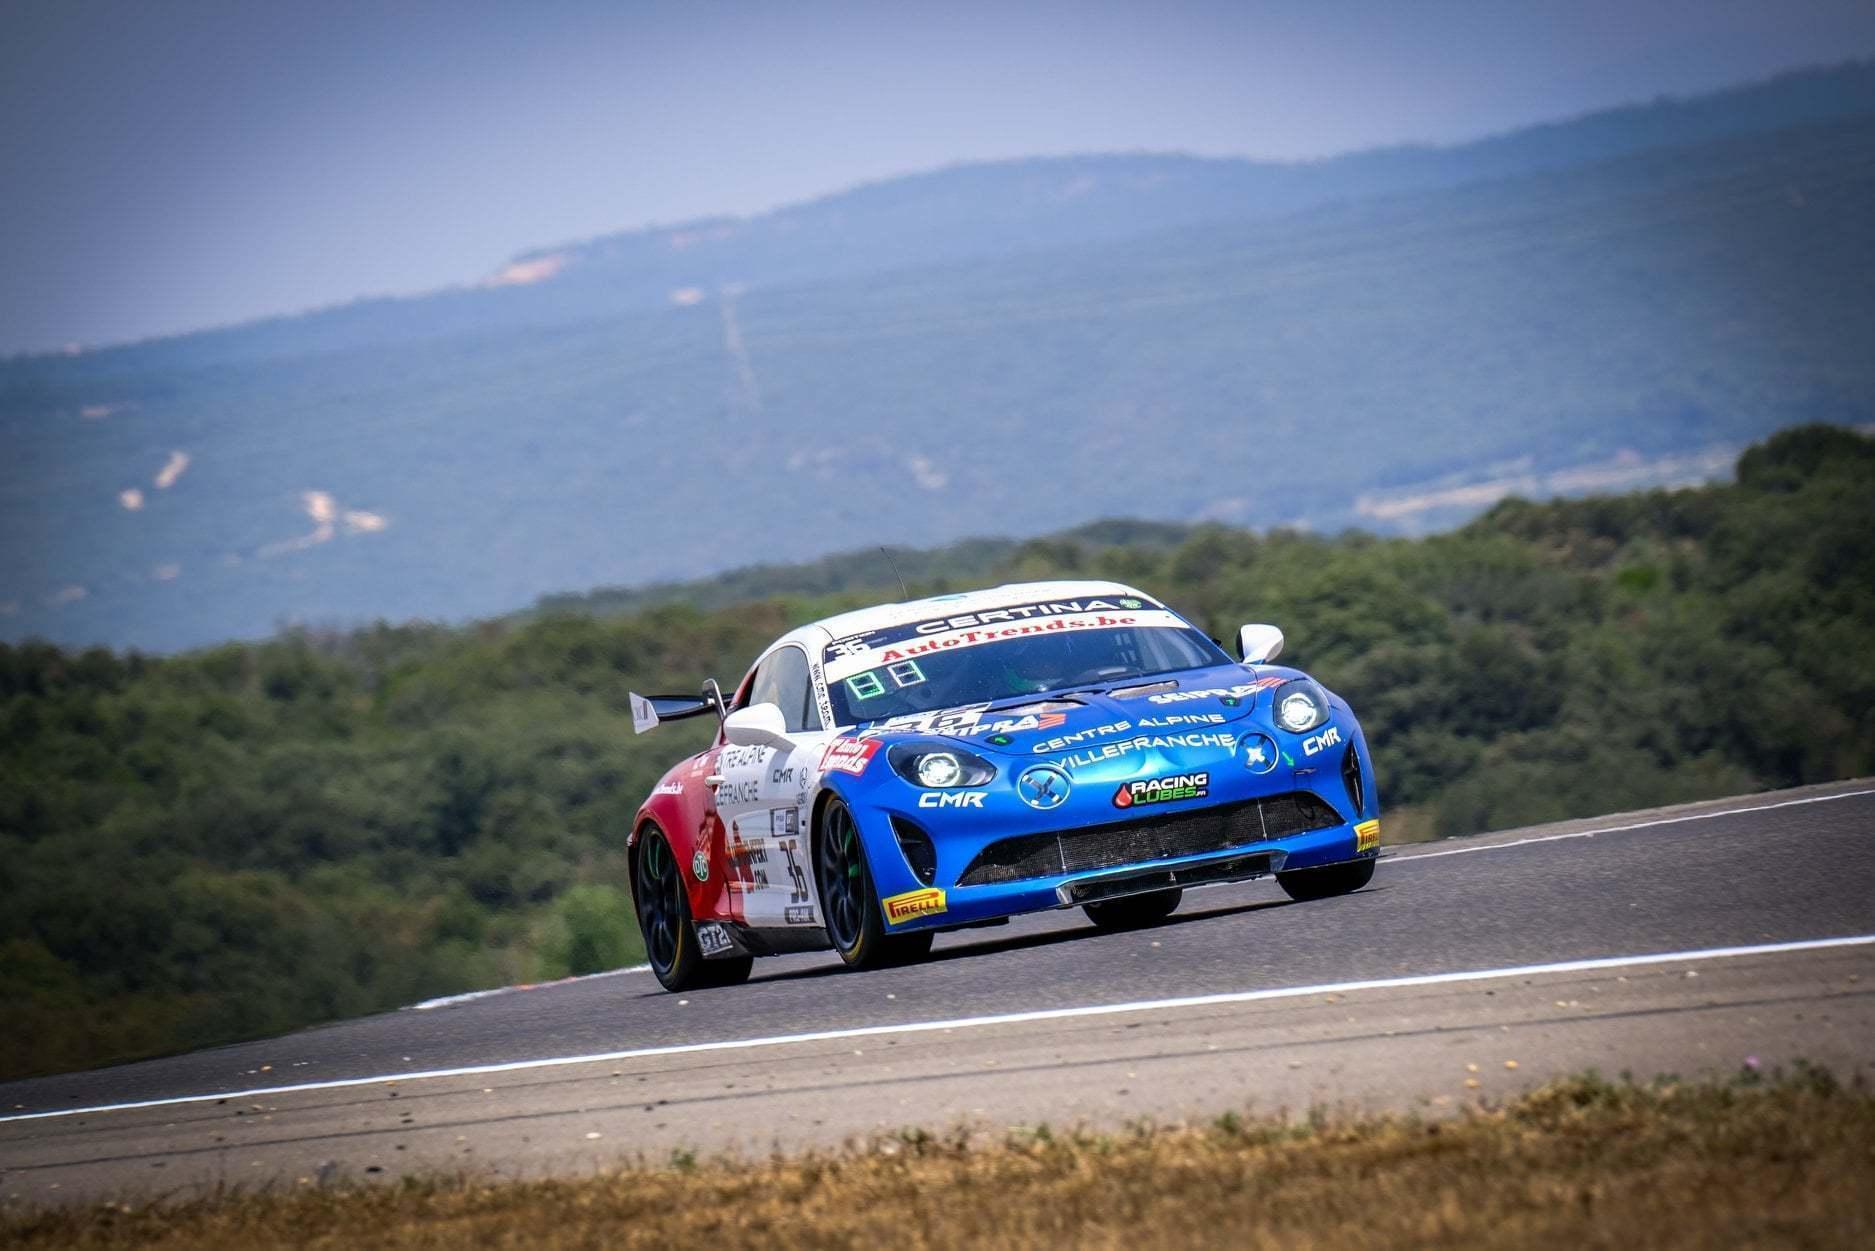 FFSA GT: CMR reprend la main Lédenon ! (Course 2) 15